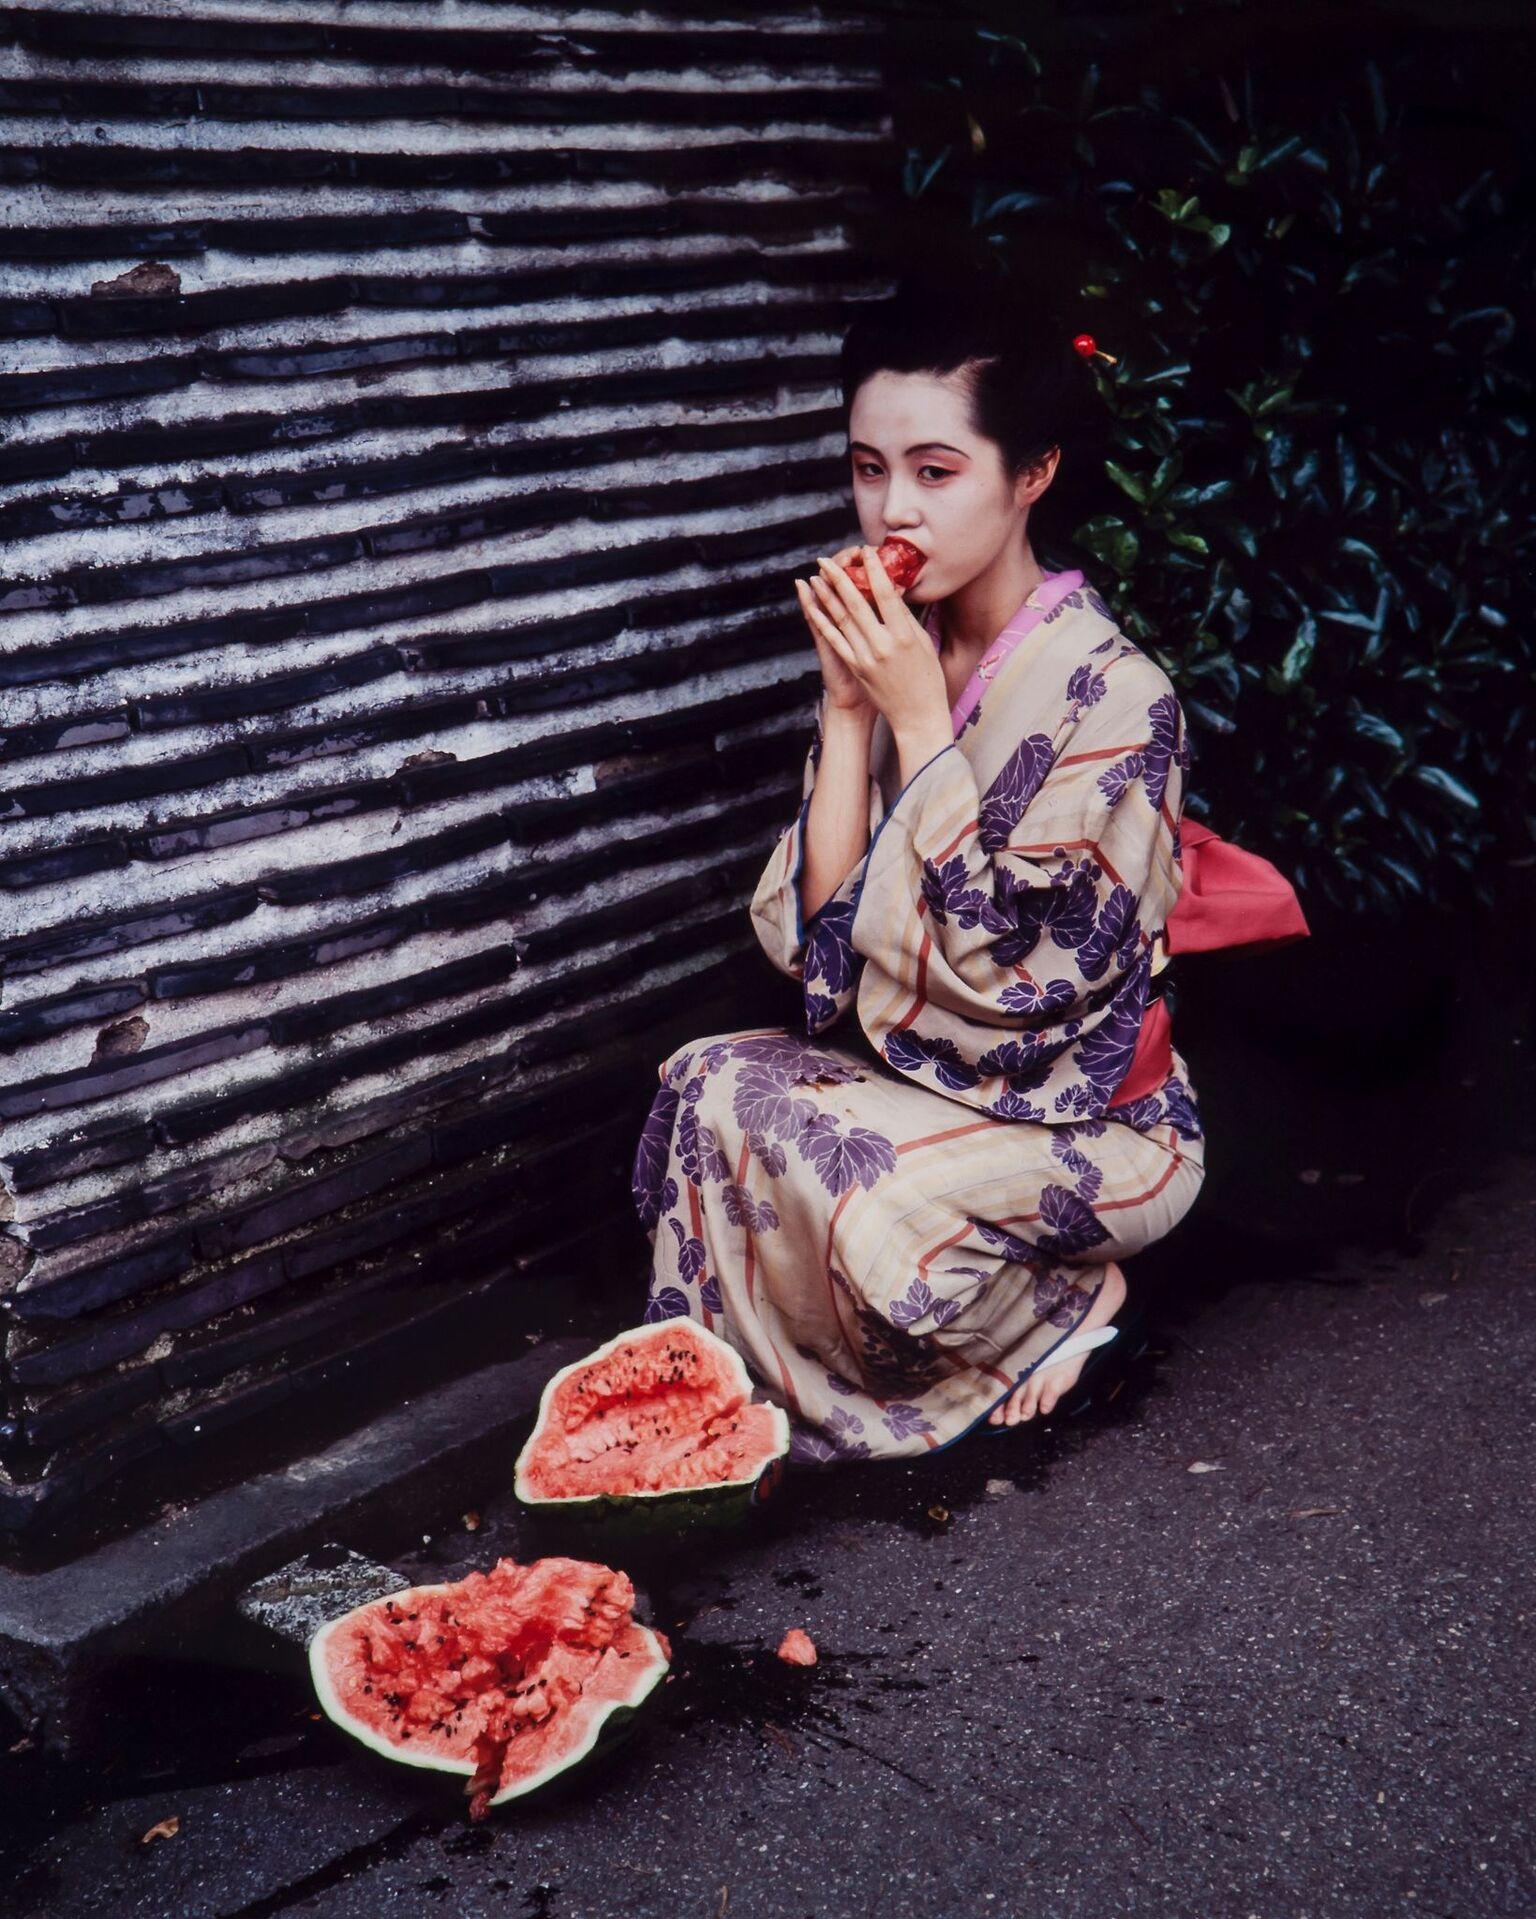 Nobuyoshi Araki, Colourscapes, 1991, C-print. Museum of Sex Collection